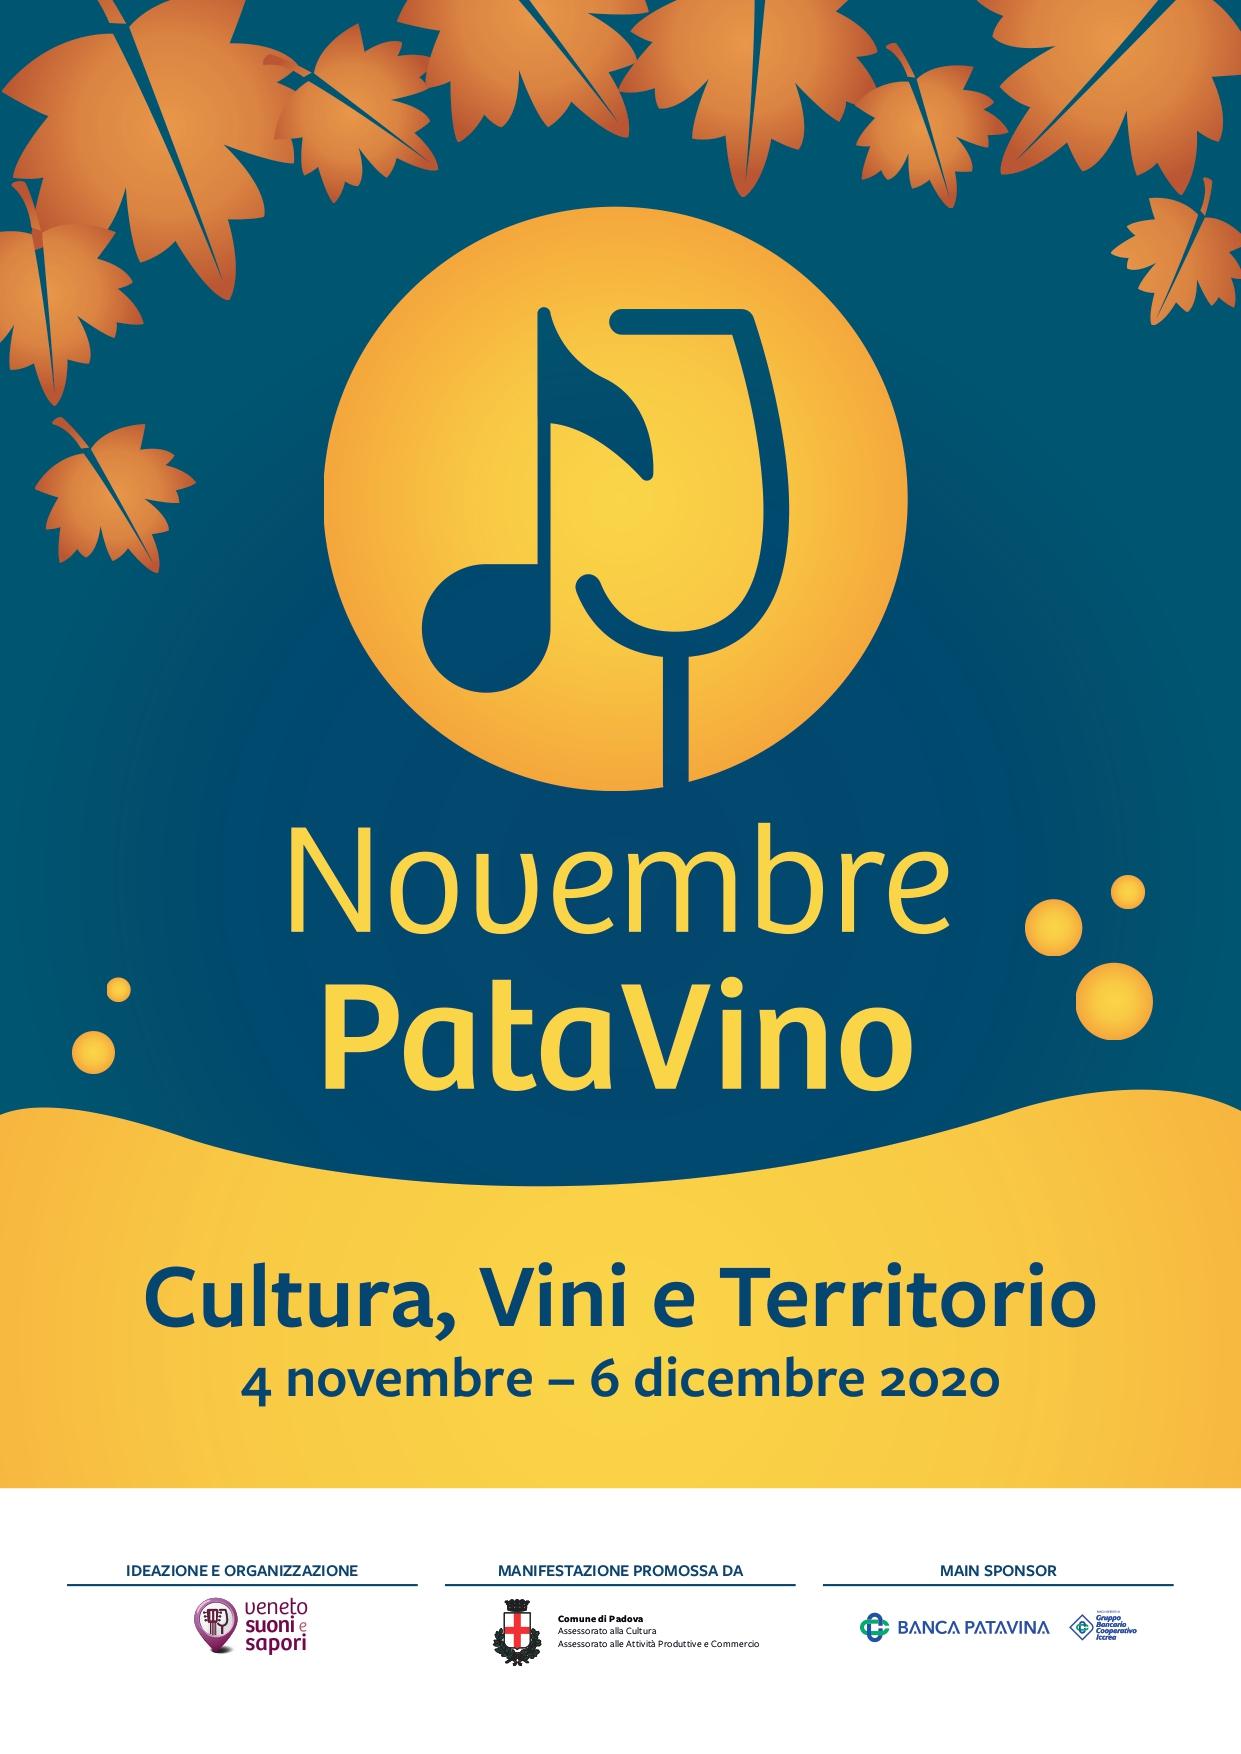 Novembre PataVino locandina